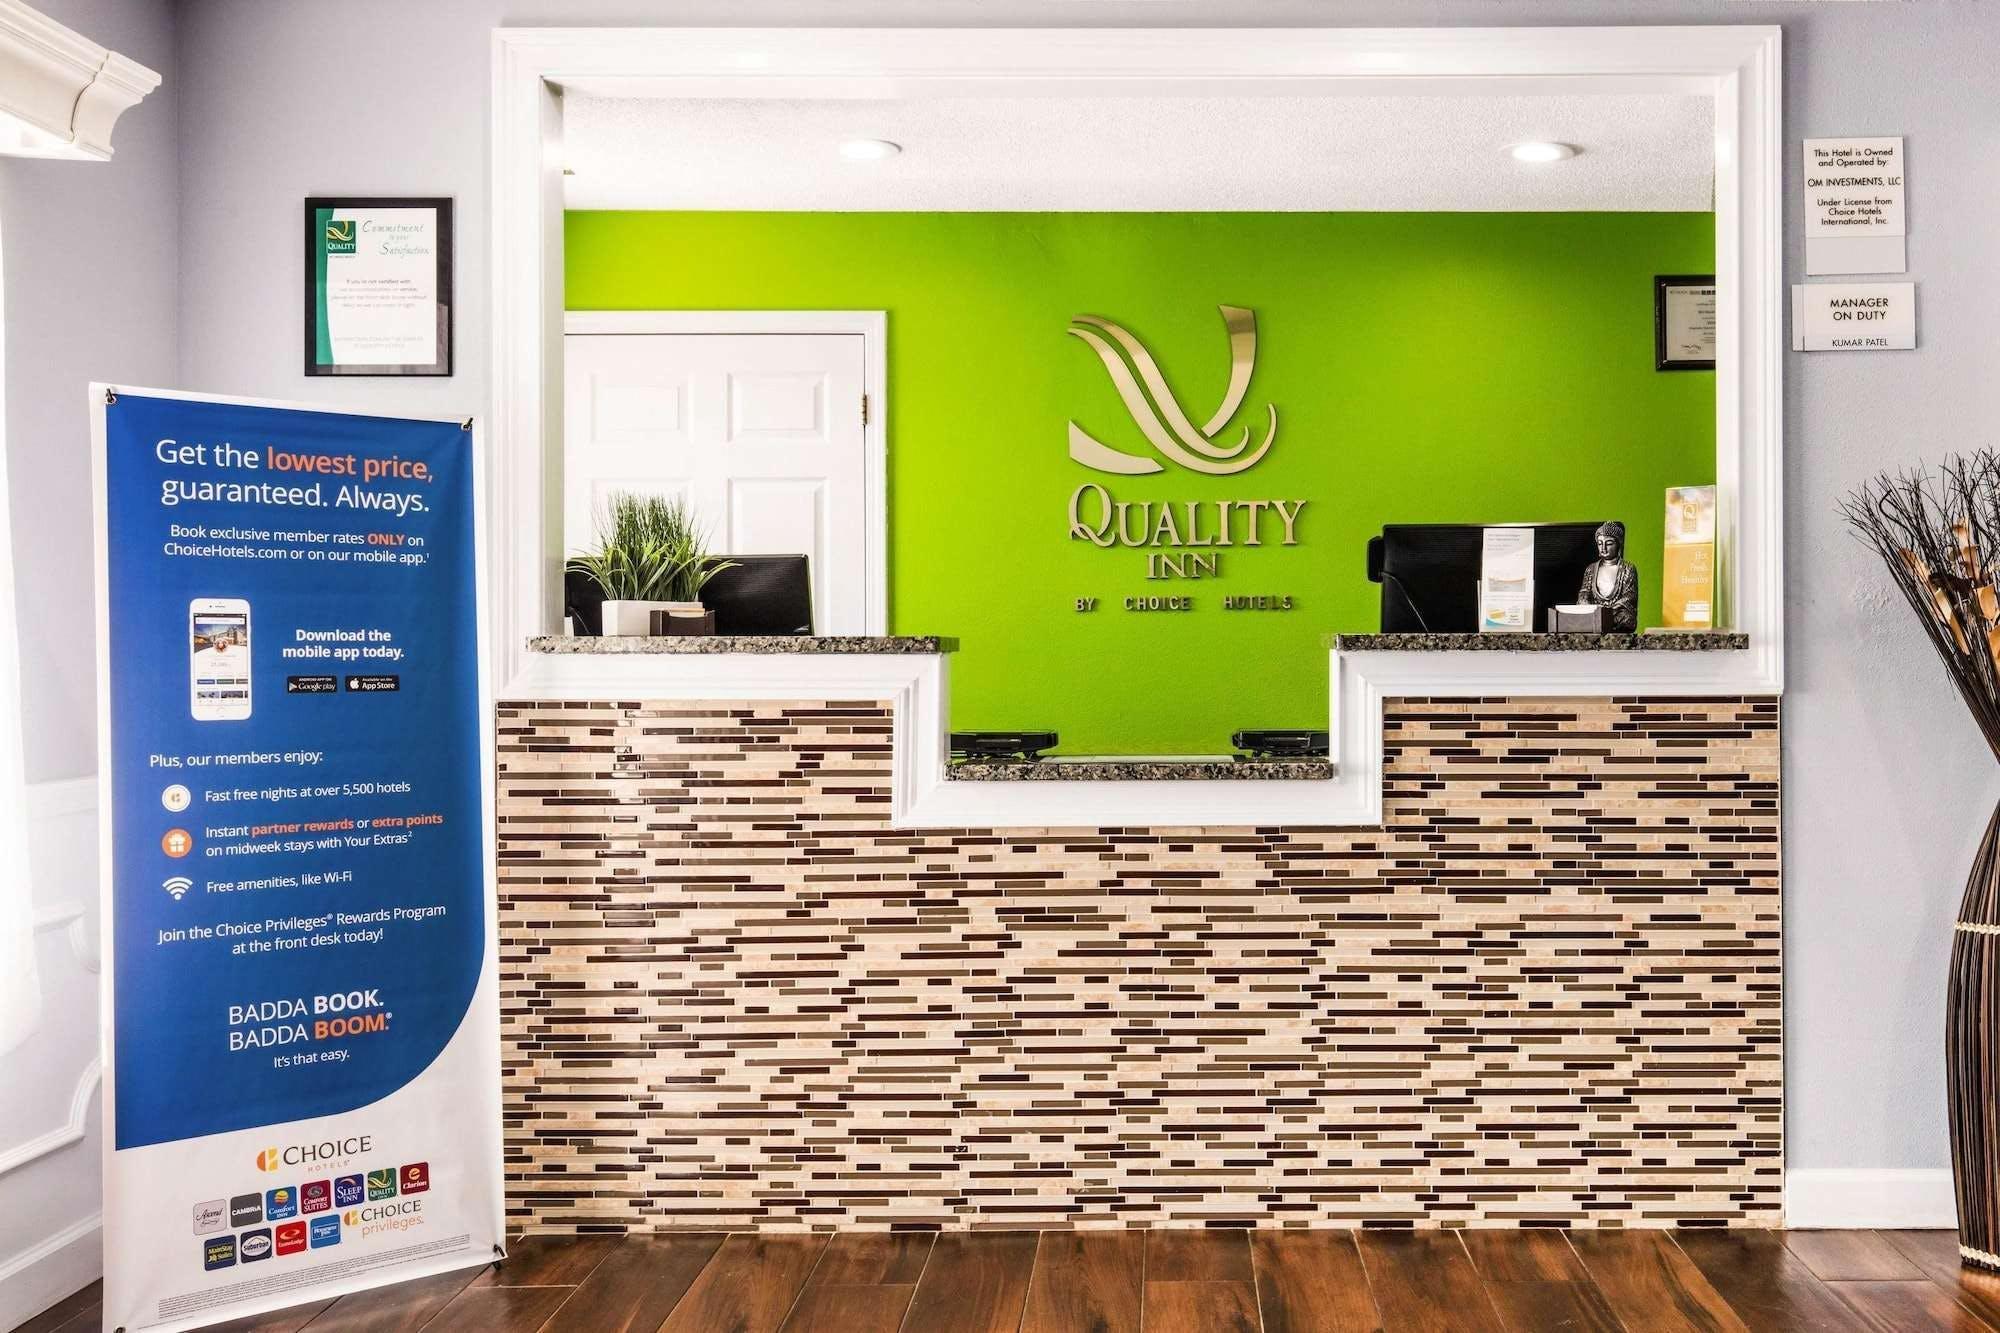 Quality Inn Trussville / Birmingham